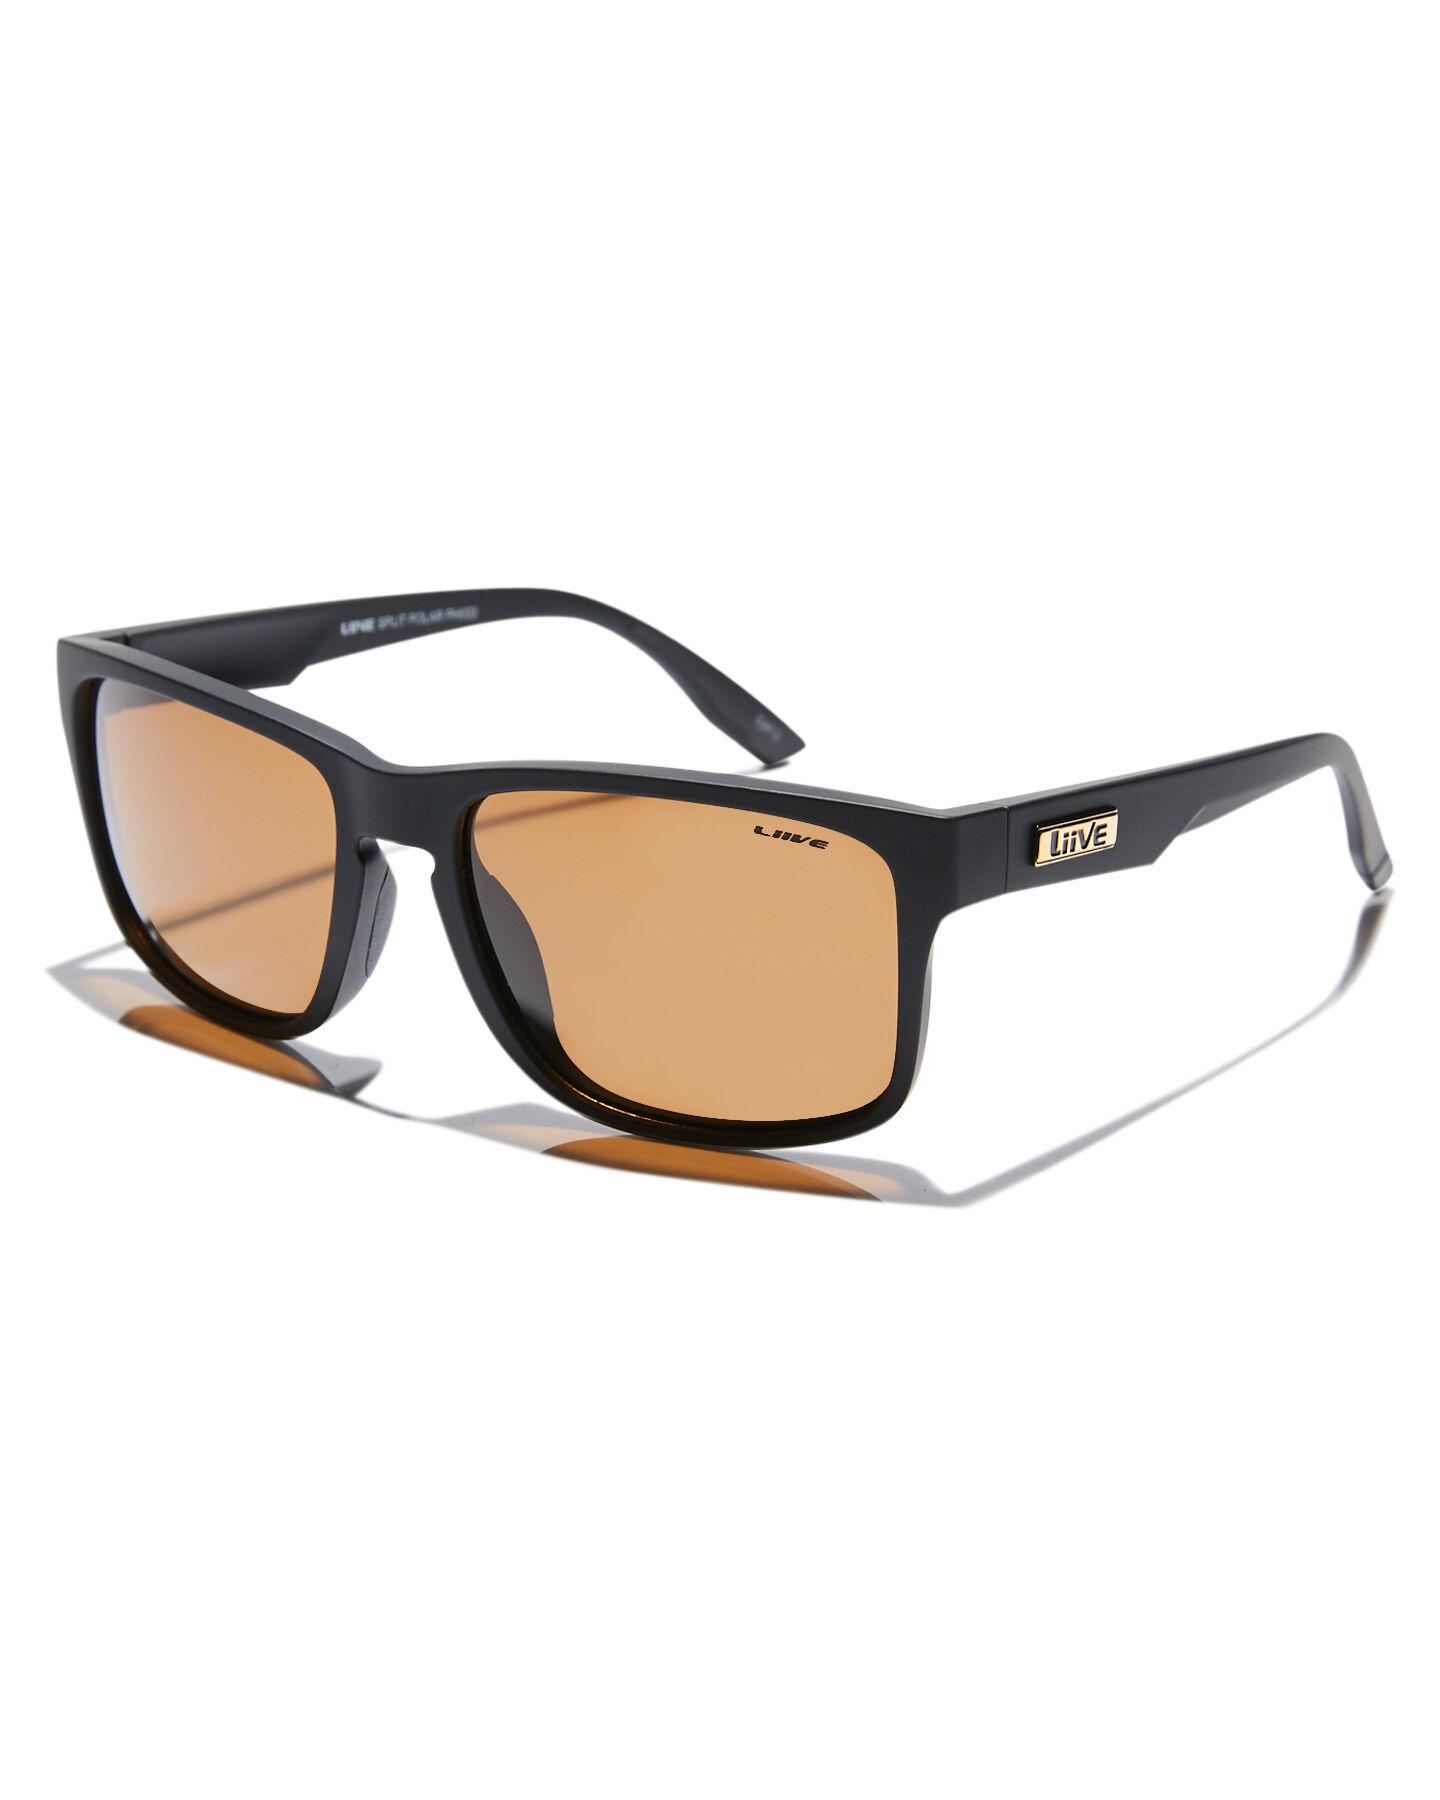 Liive Vision NEW Stamos Polar Matte Black Sunnies Mad Hueys Sunglasses